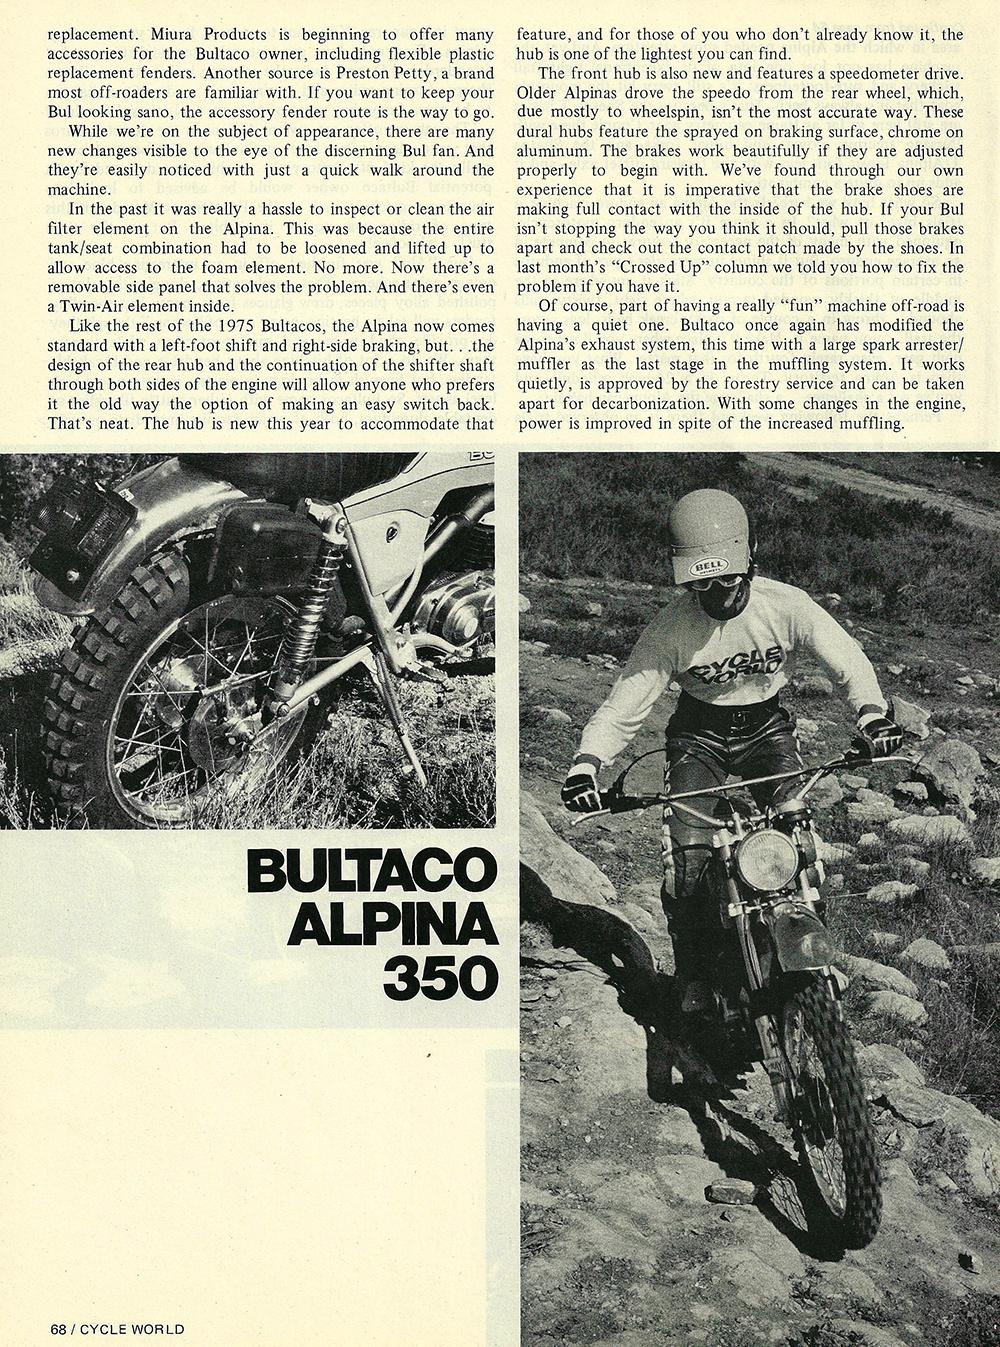 1975 Bultaco Alpina 350 road test 03.jpg